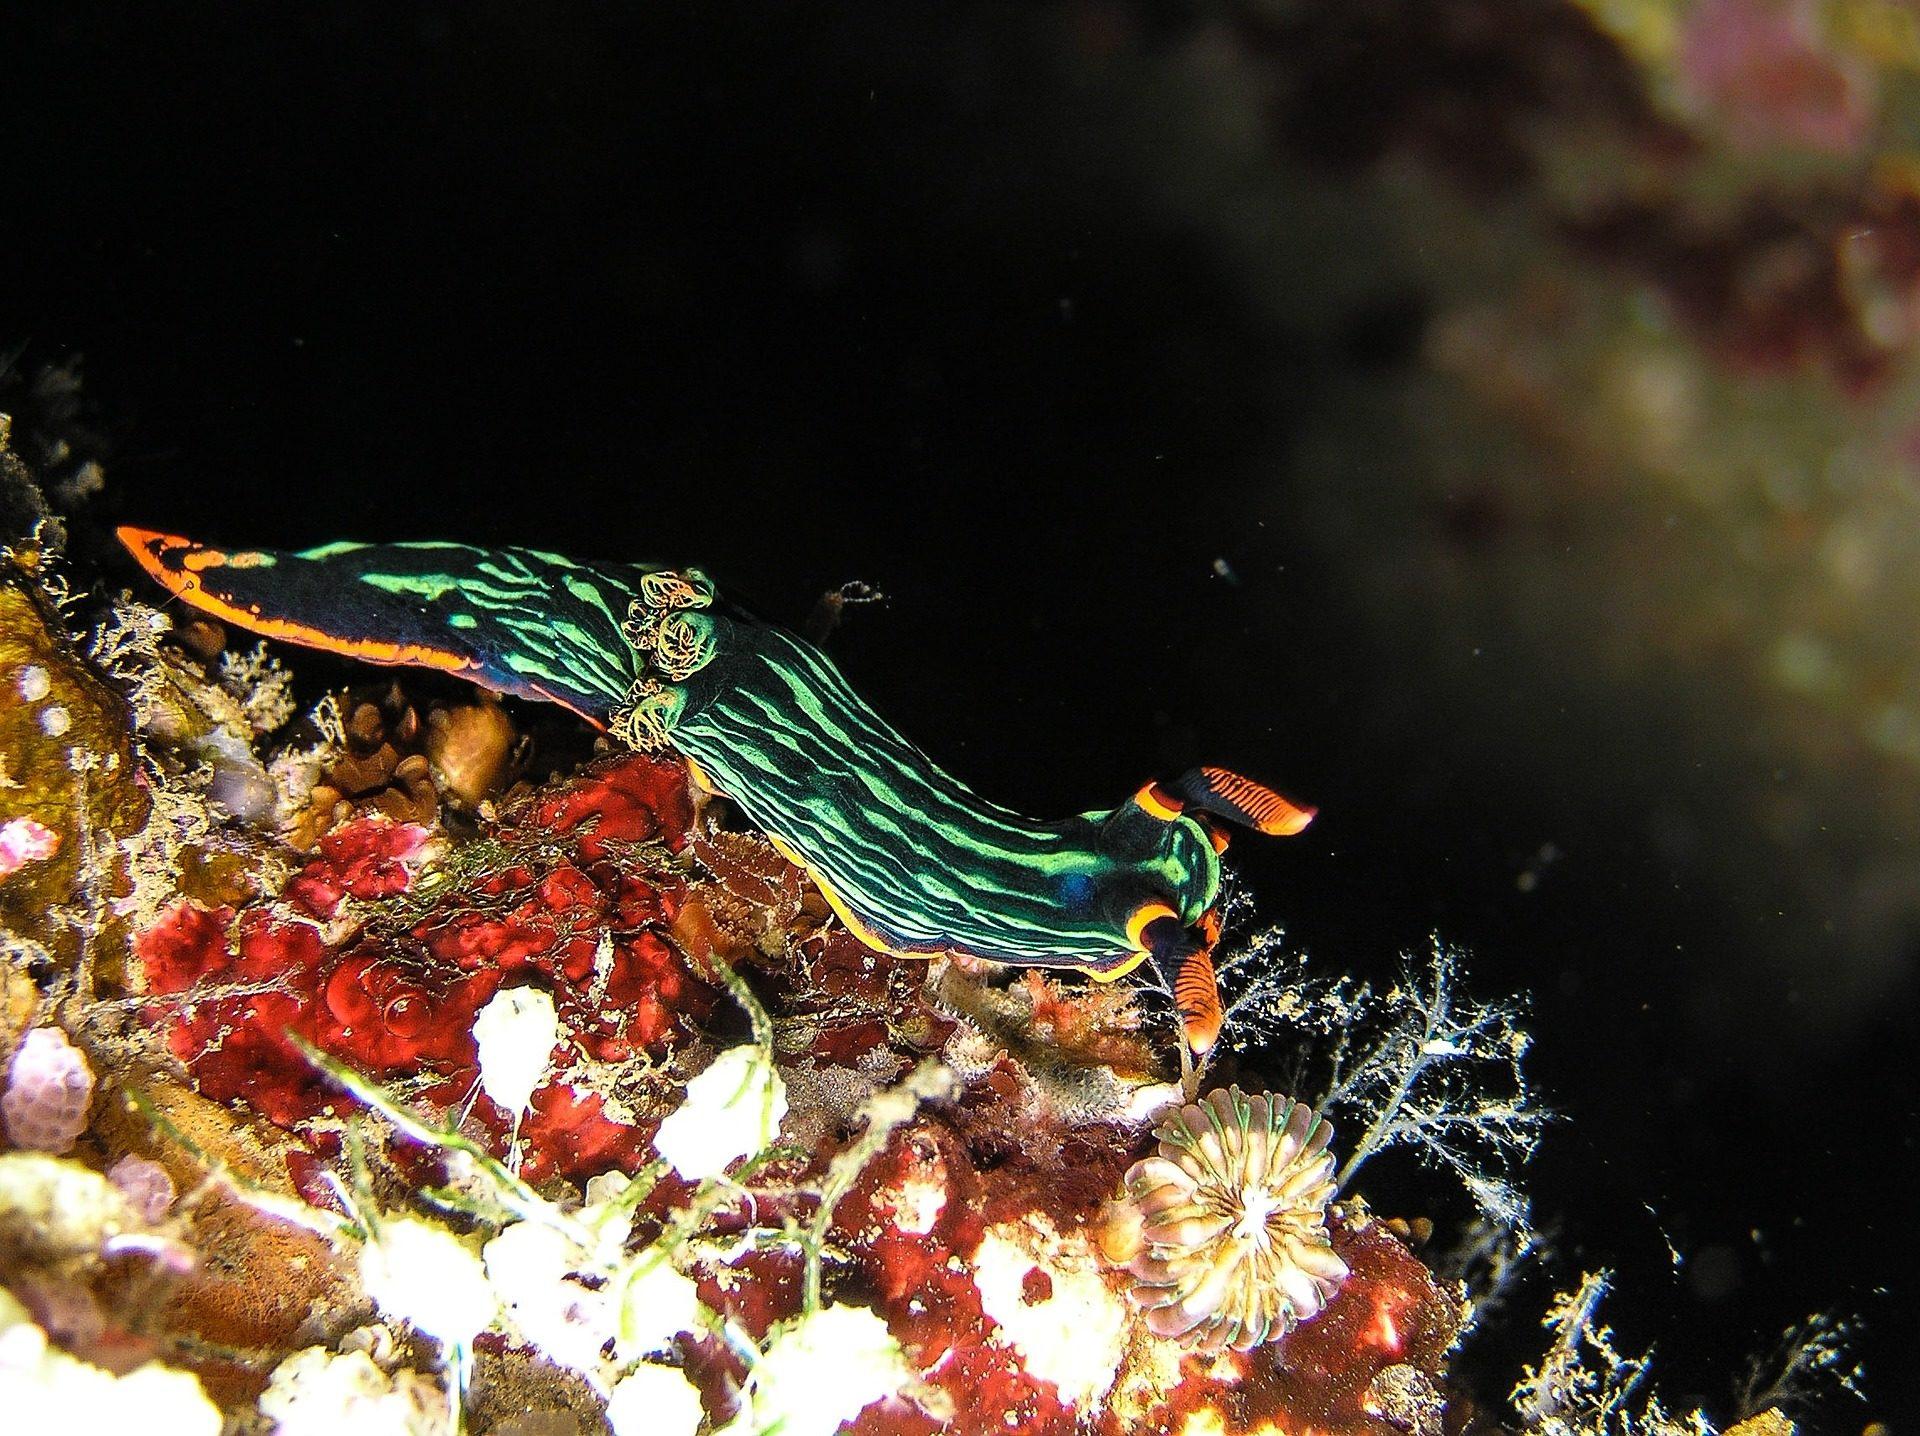 caracol, marino, submarina, mar, océano, fauna - Fondos de Pantalla HD - professor-falken.com